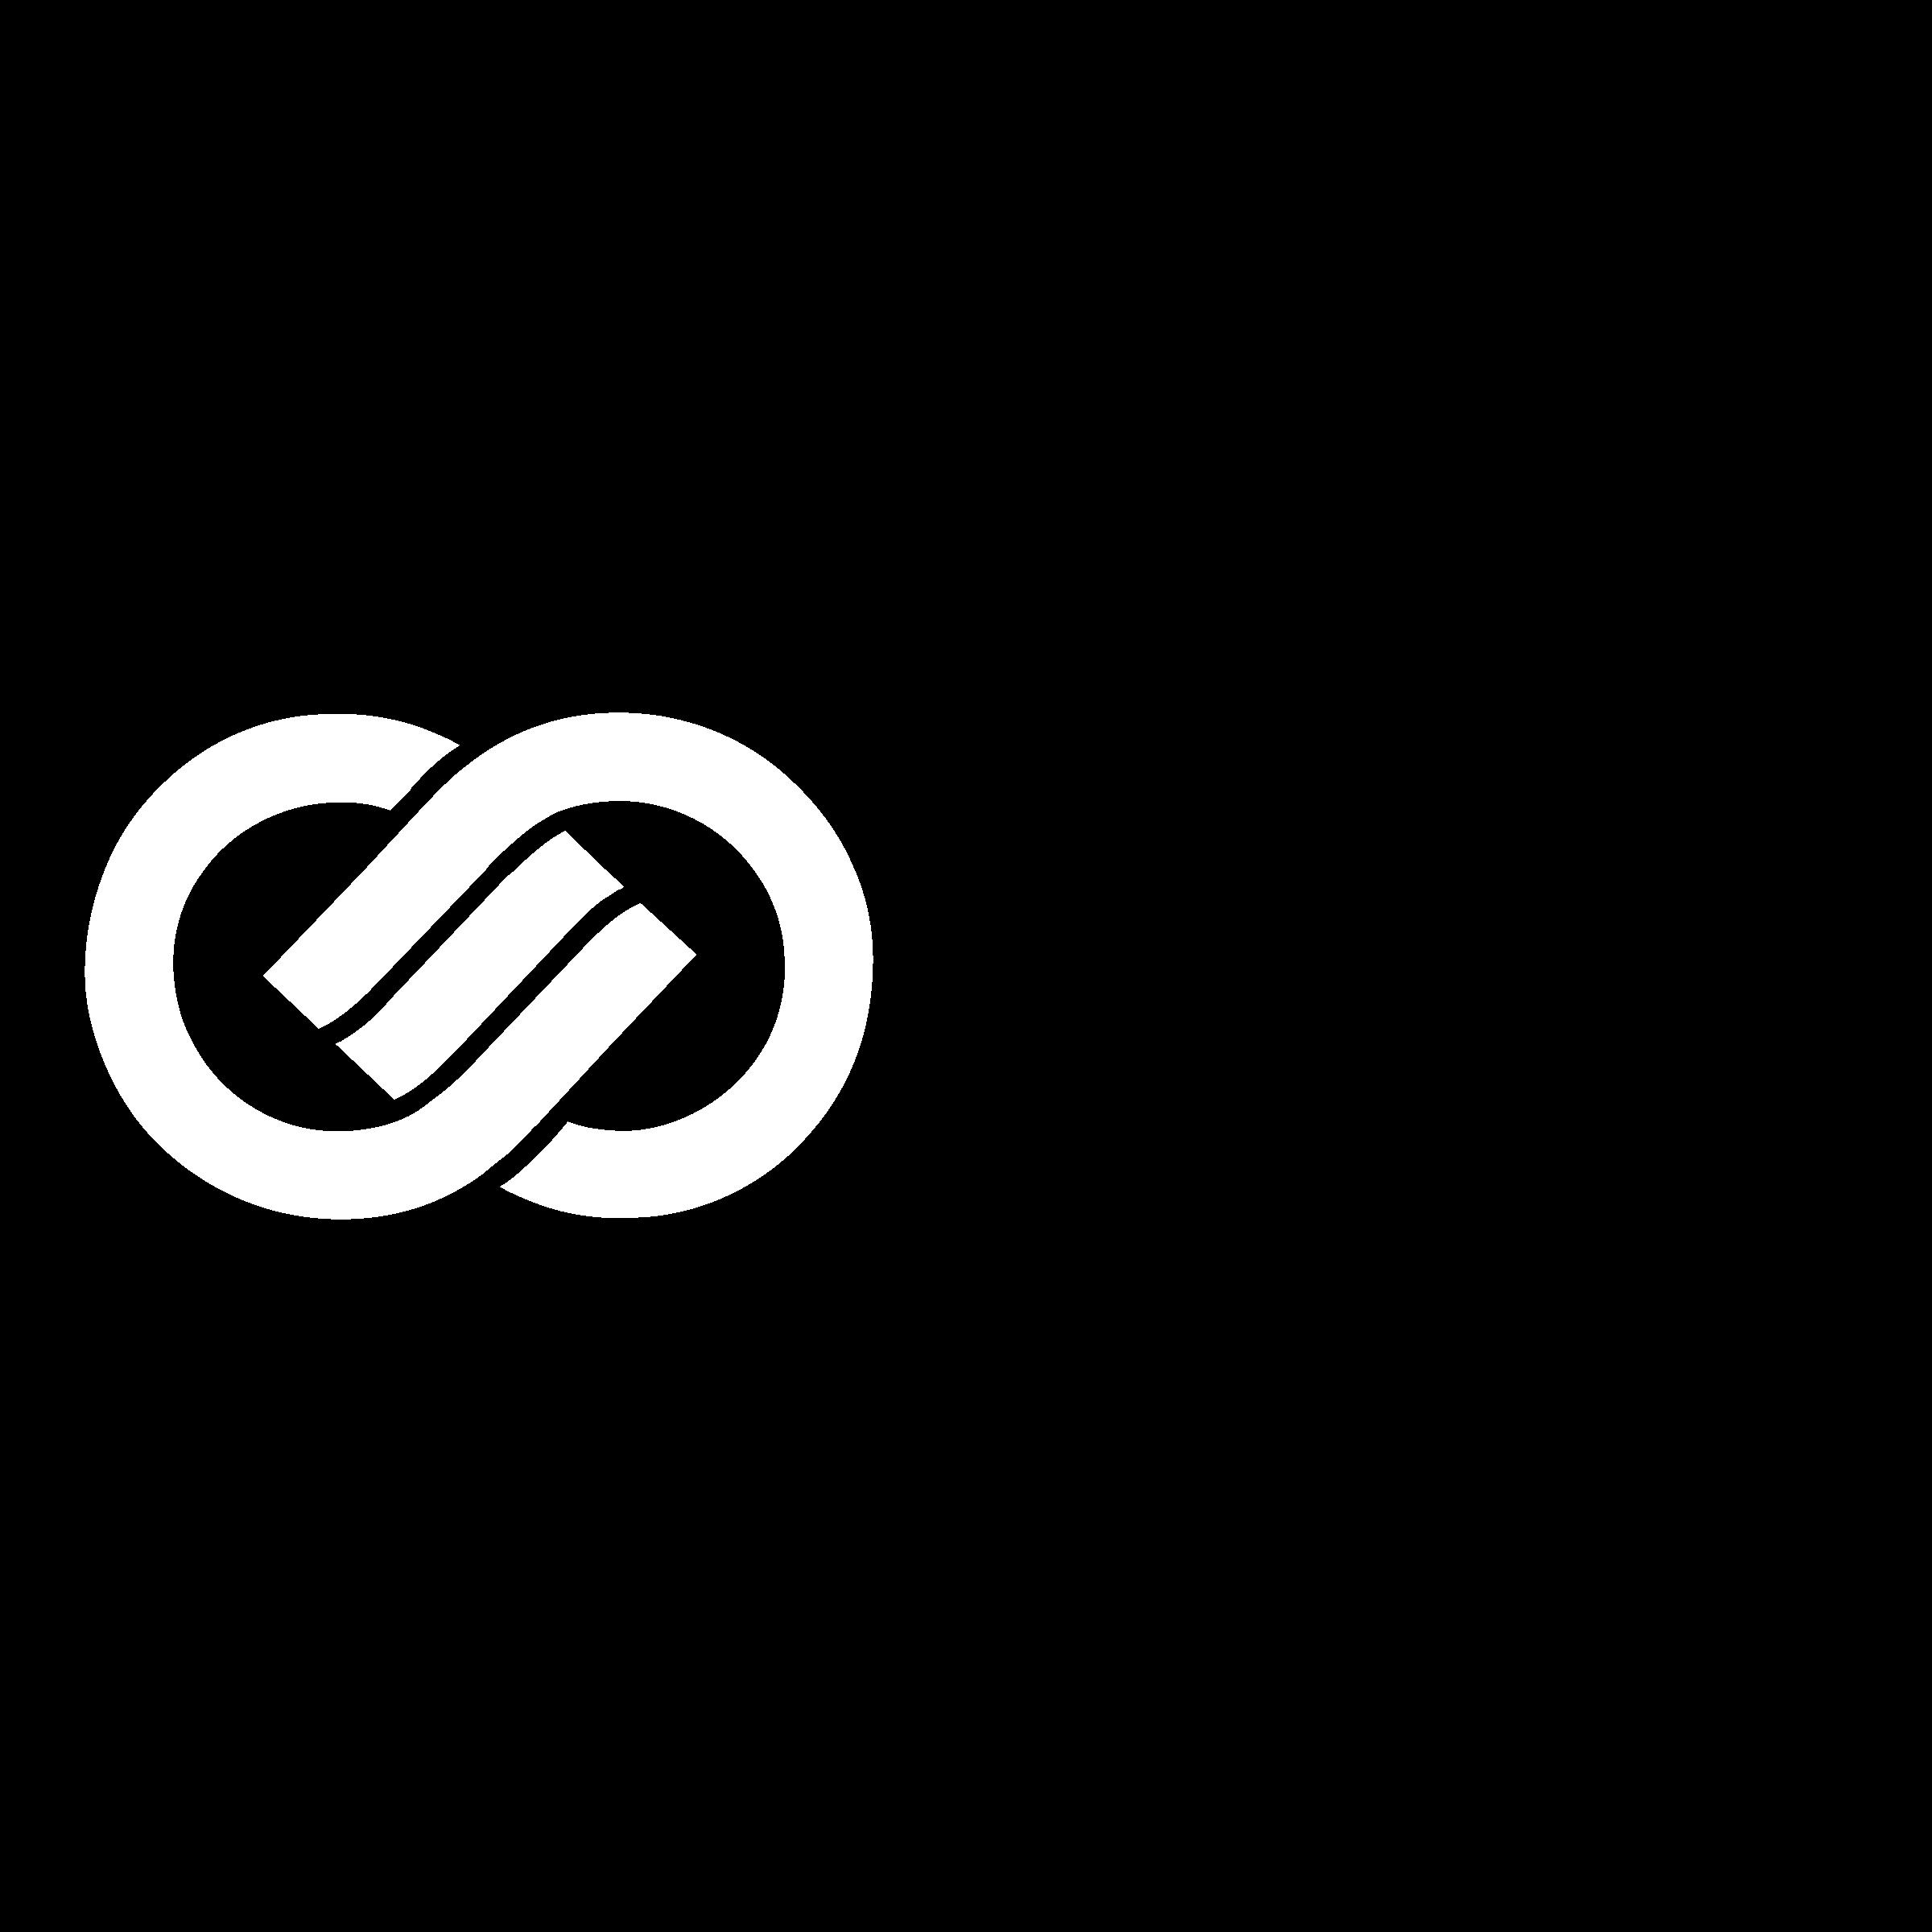 NCR Logo Black And White